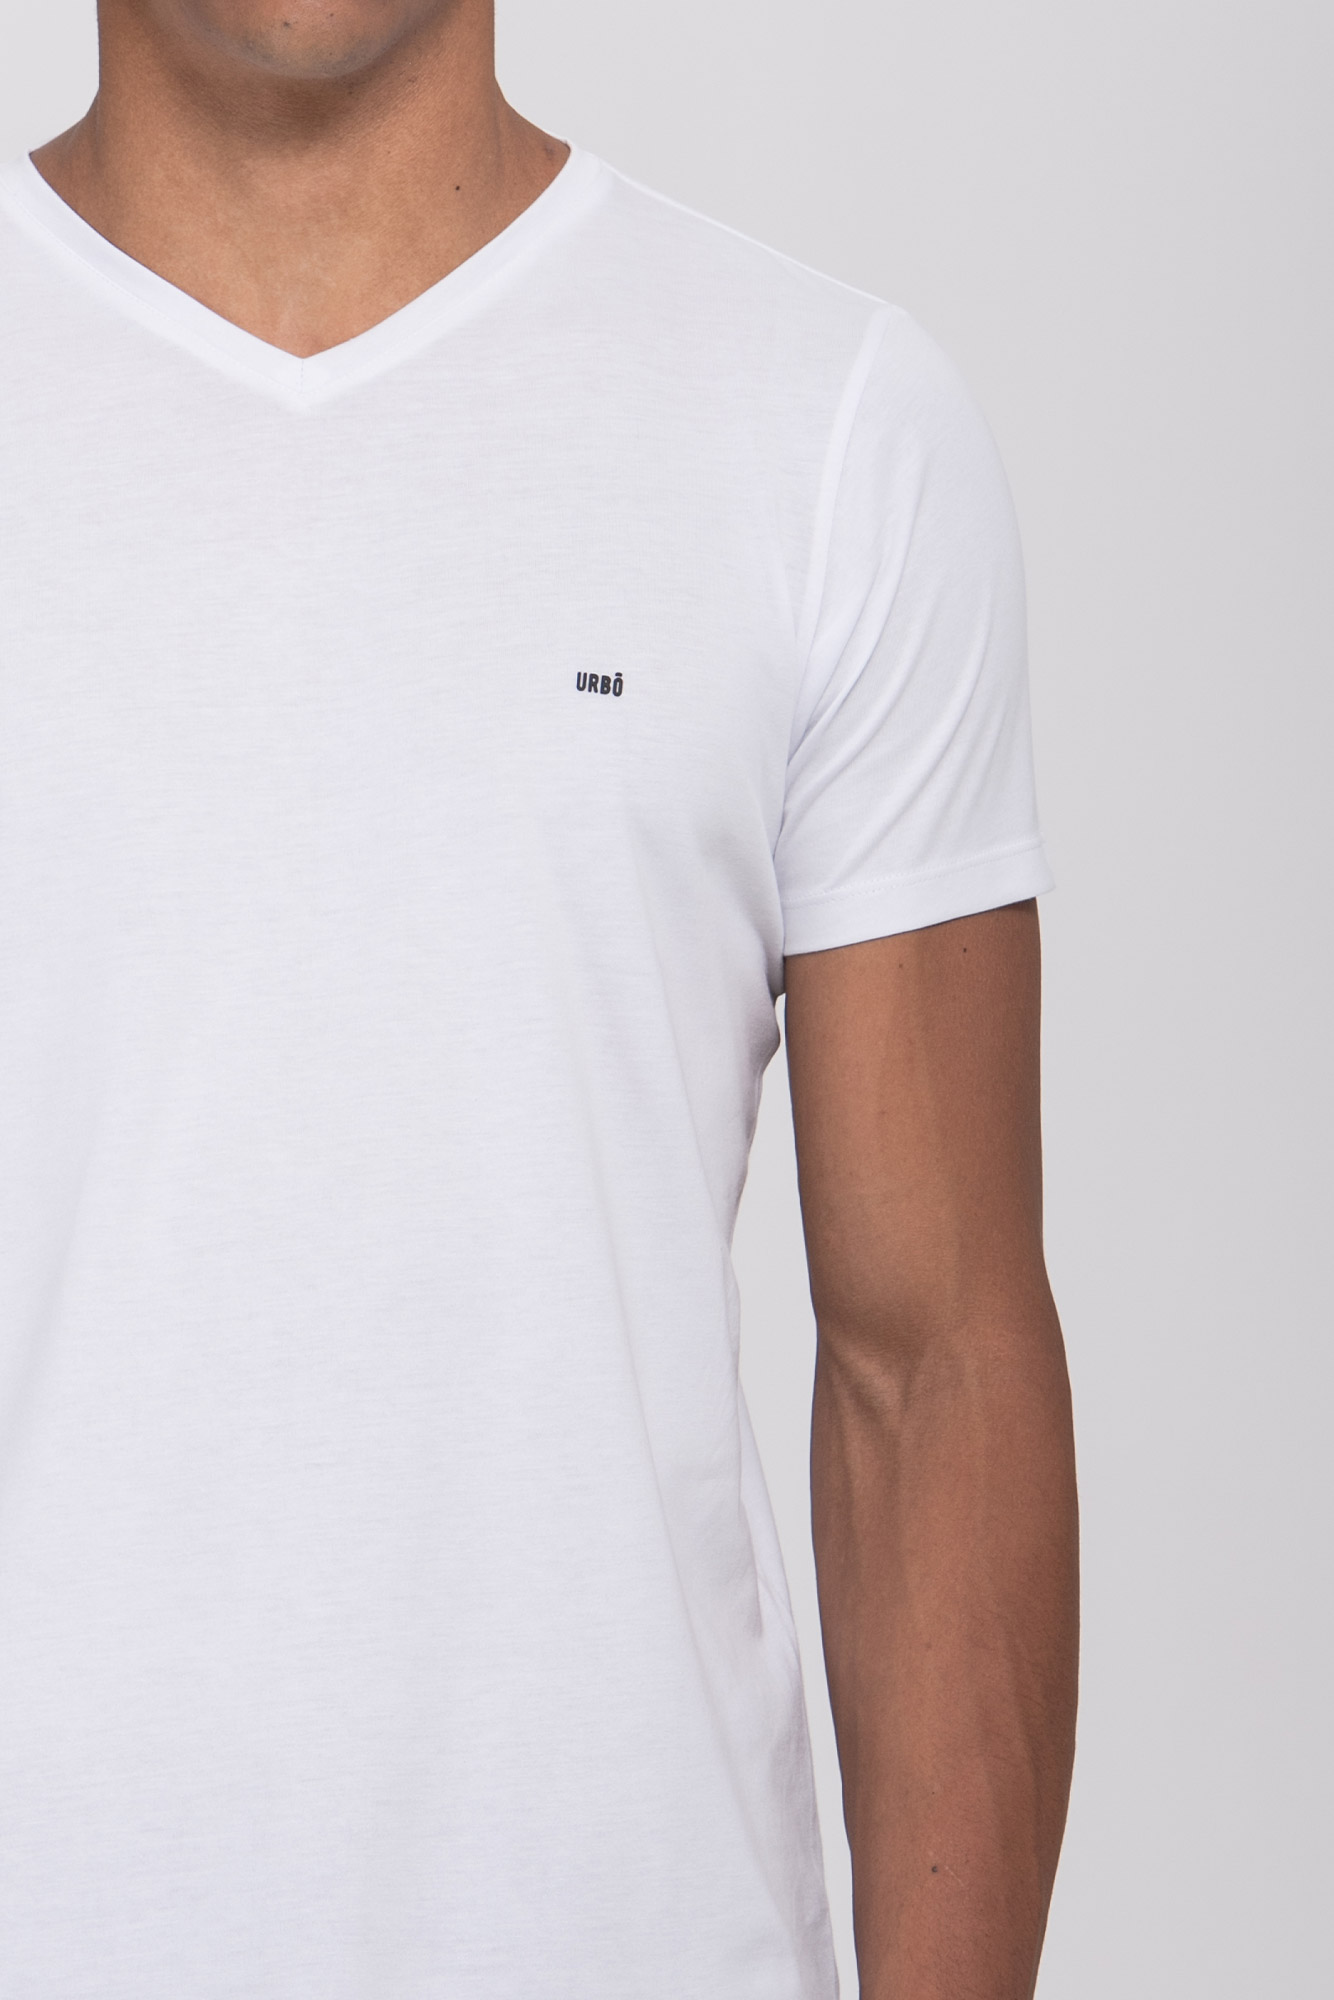 Camiseta Egypt Simple V Branca